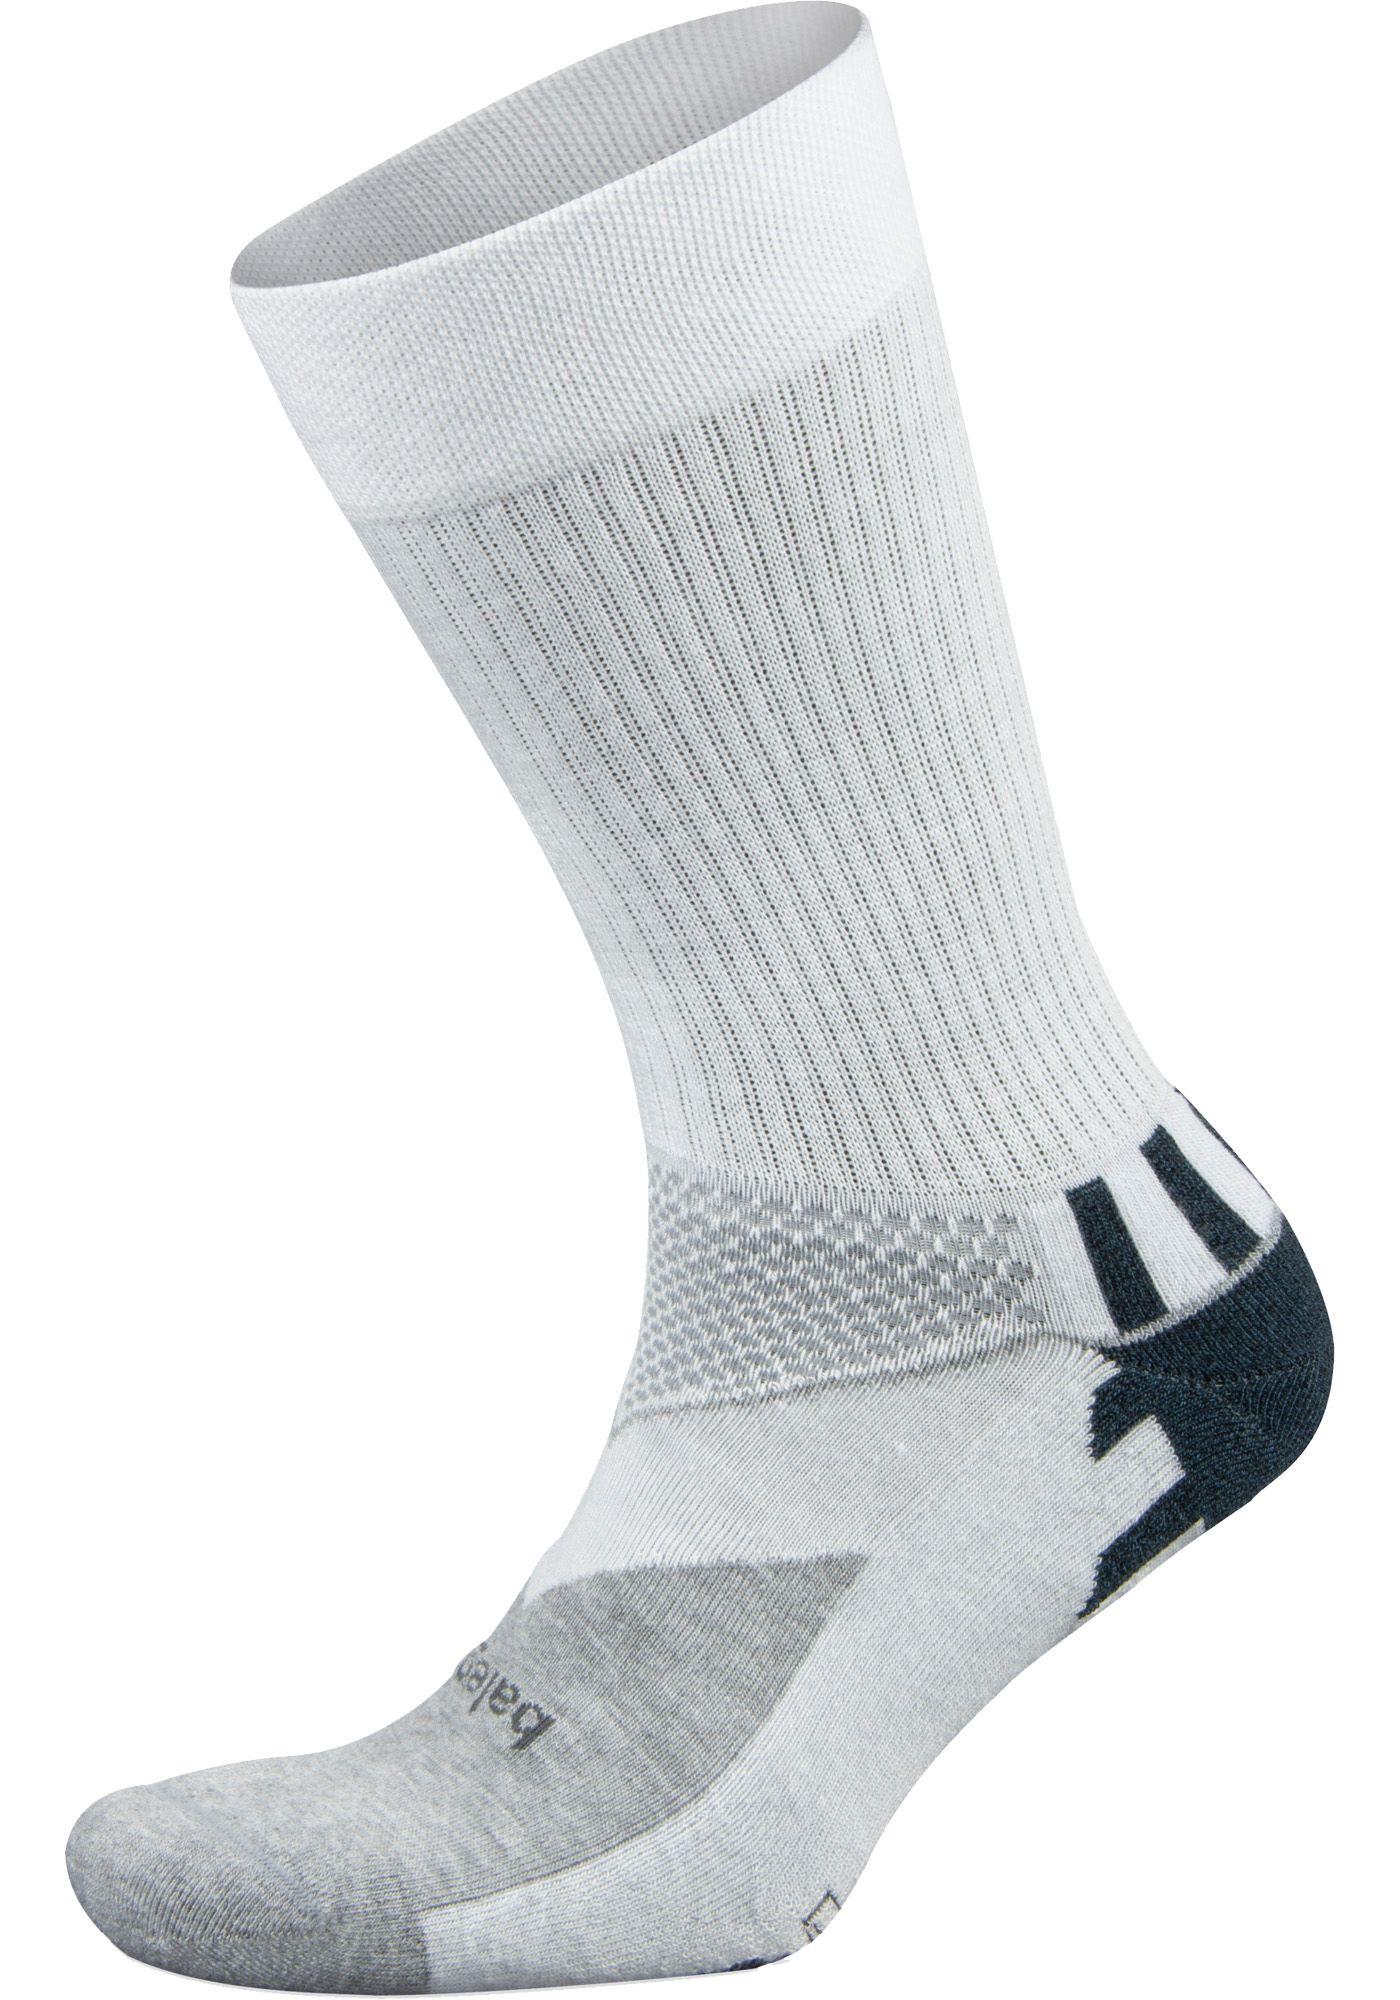 Balega Enduro V-Tech Crew Running Socks